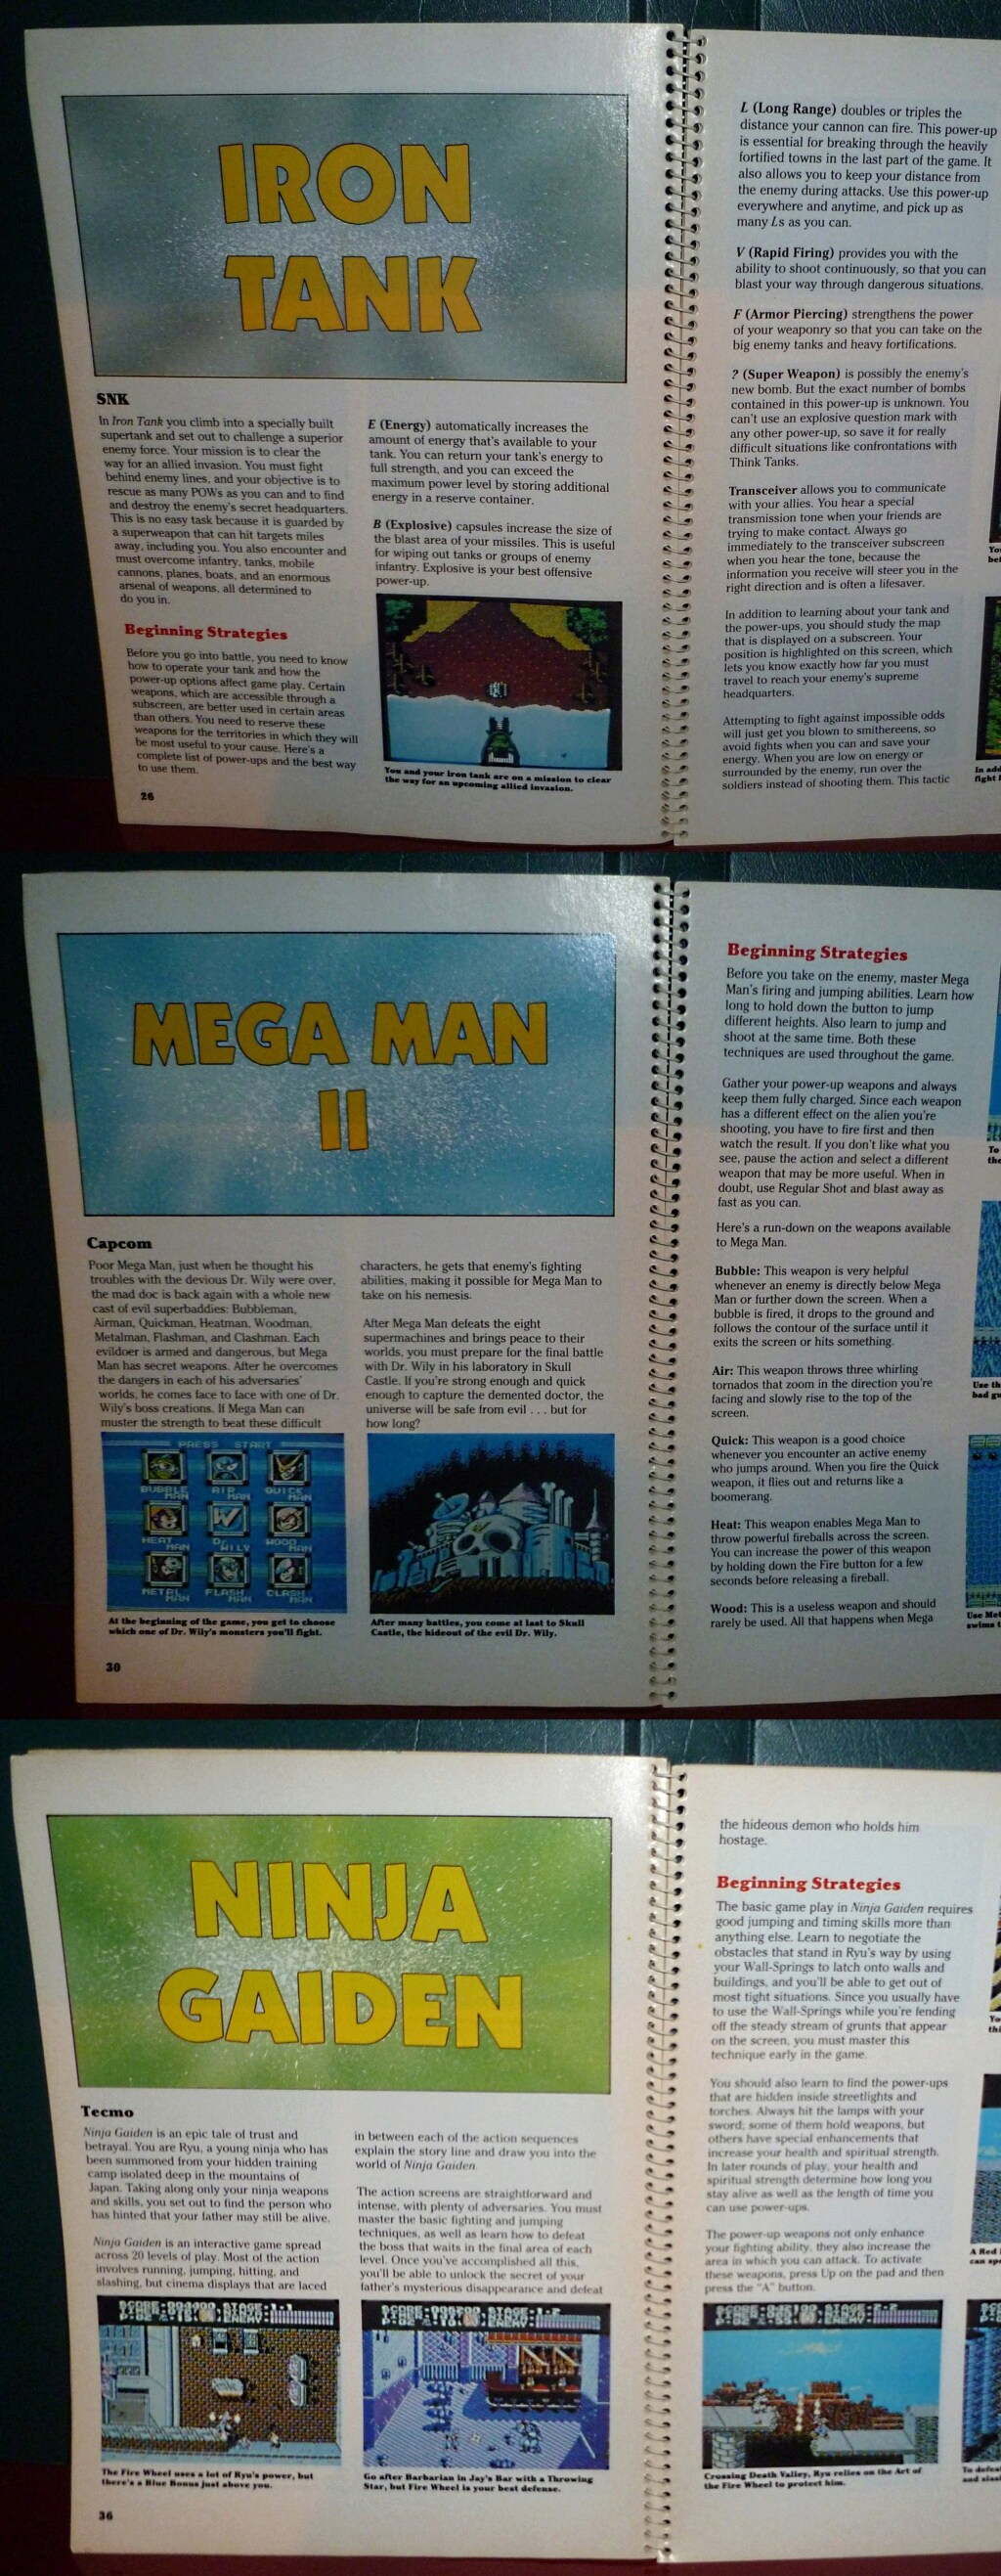 My Video Game Figures & Strategy Guides: Super Godzilla & Predator Games! Book_310